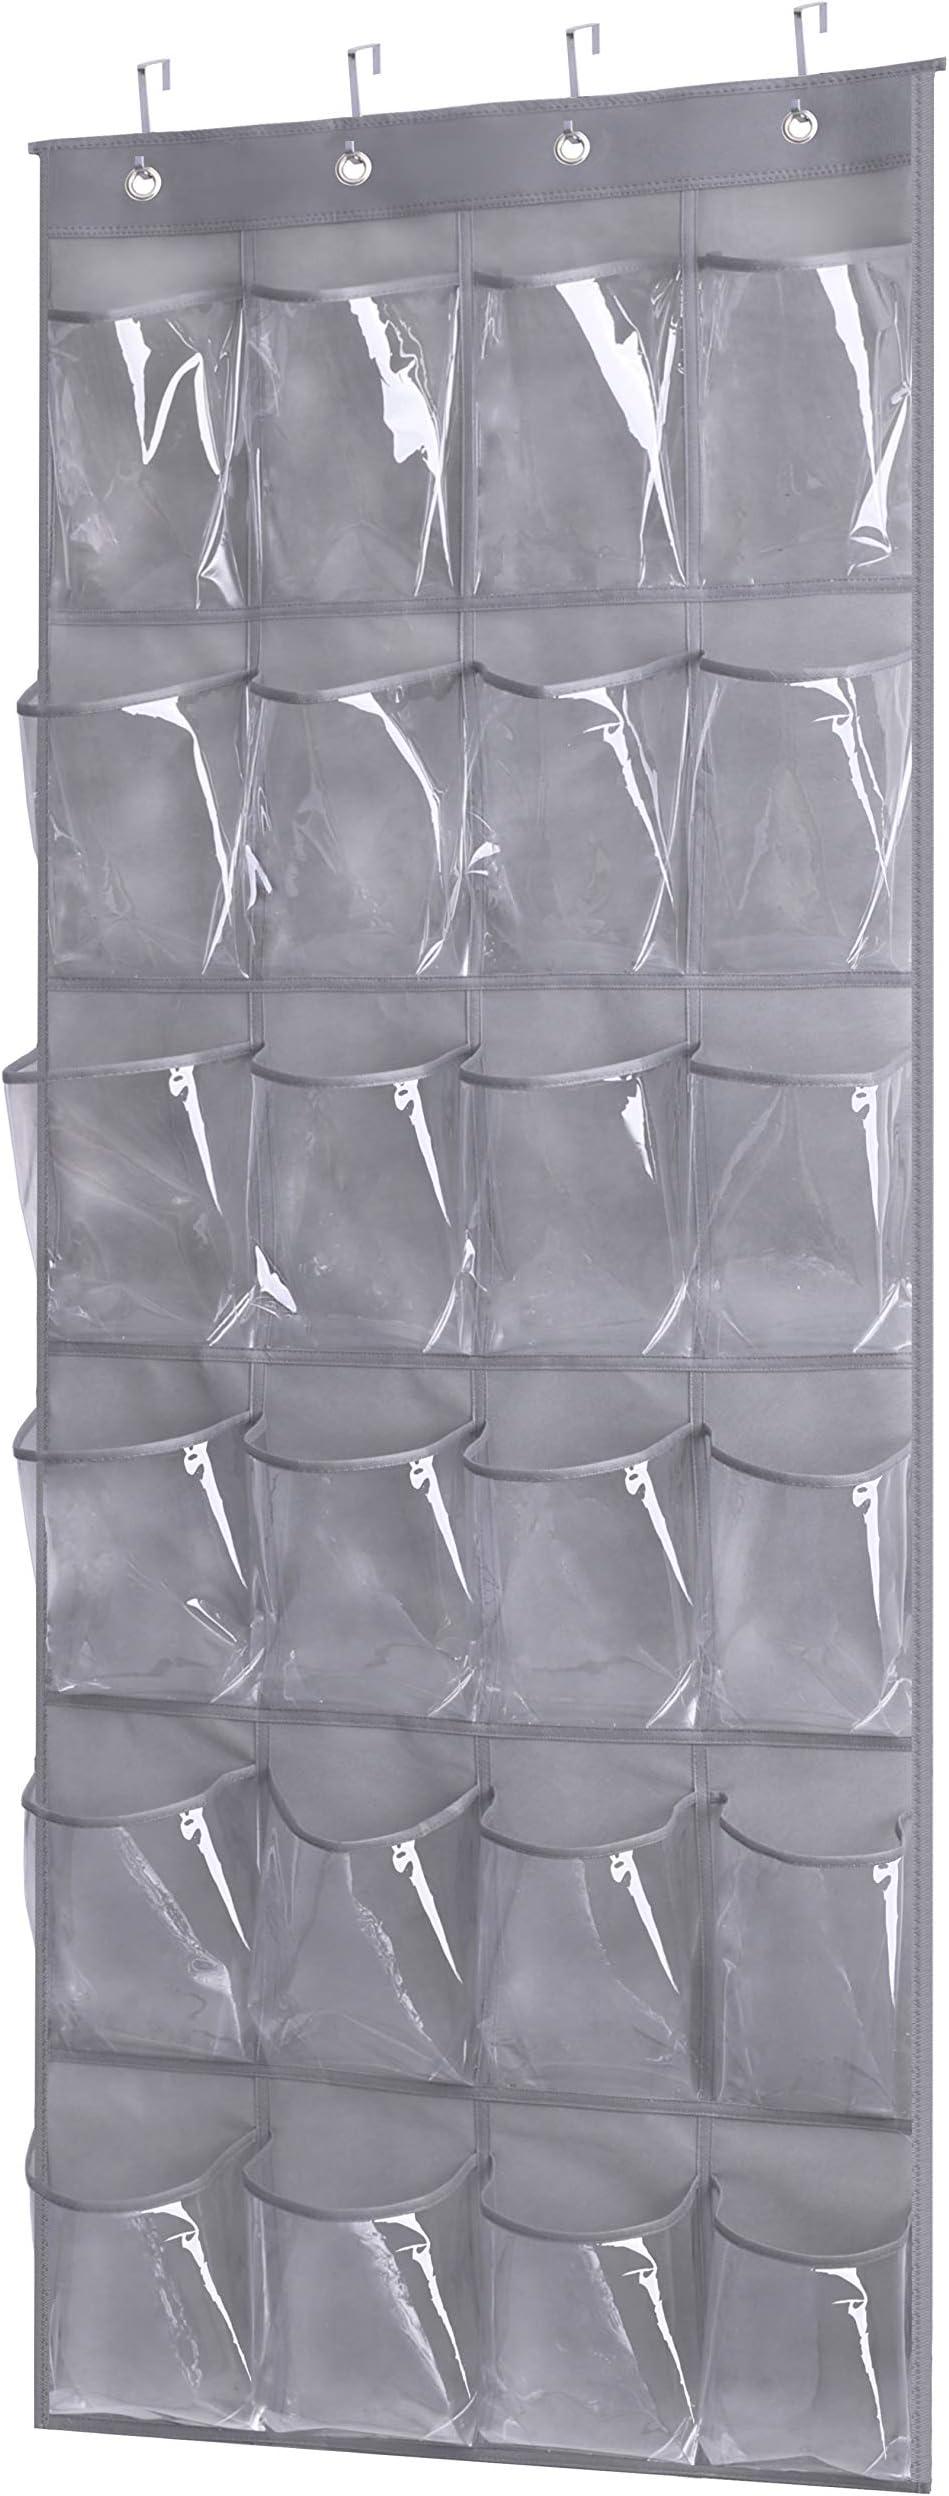 Kimbora Over the Door Shoe Rack with 24 Clear PVC Pockets Hanging Organizer for Closet Bathroom Kitchen, Grey